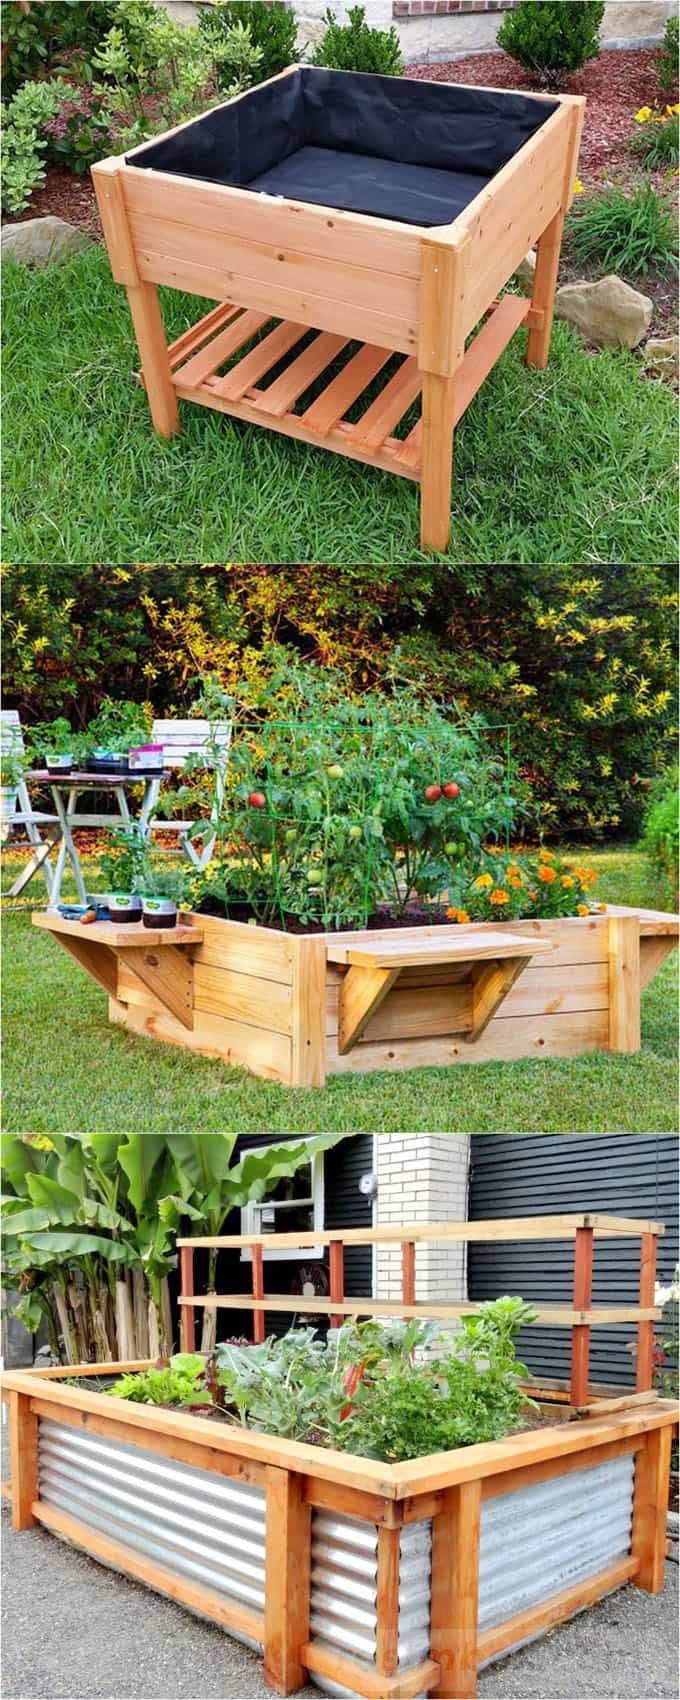 diy garden easy-98657048072316232